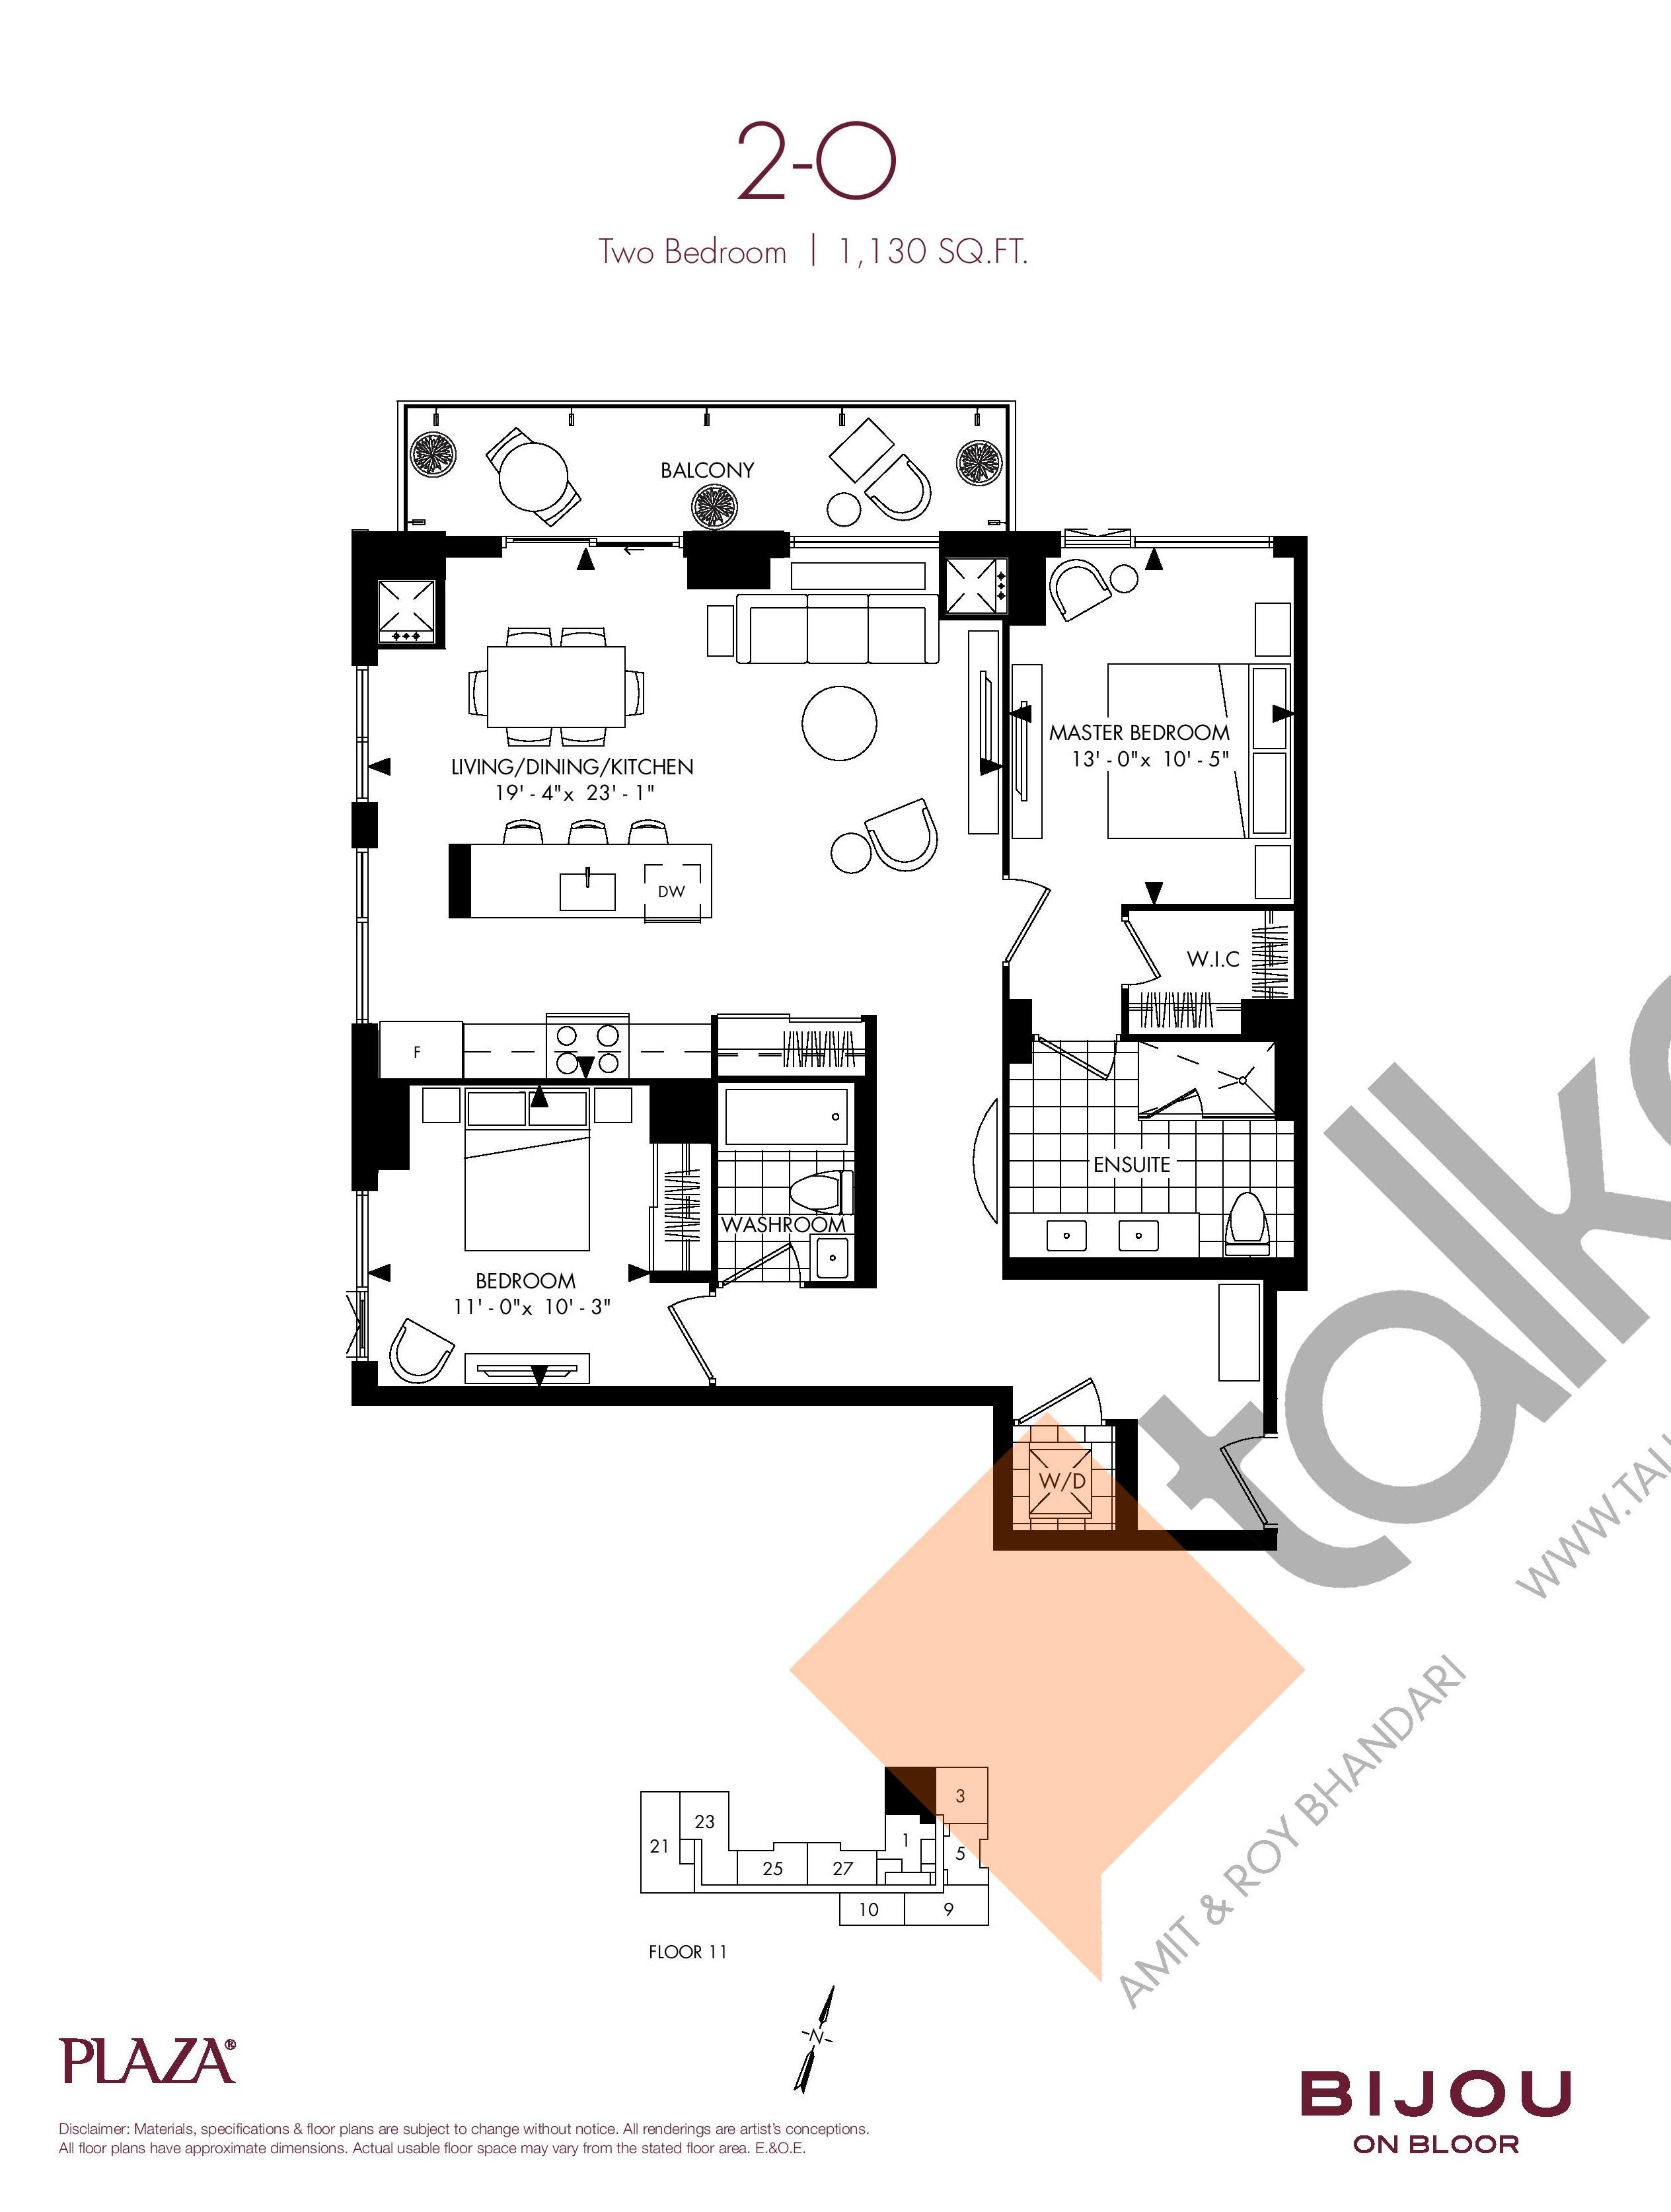 Suite 2-O Floor Plan at Bijou On Bloor Condos - 1130 sq.ft